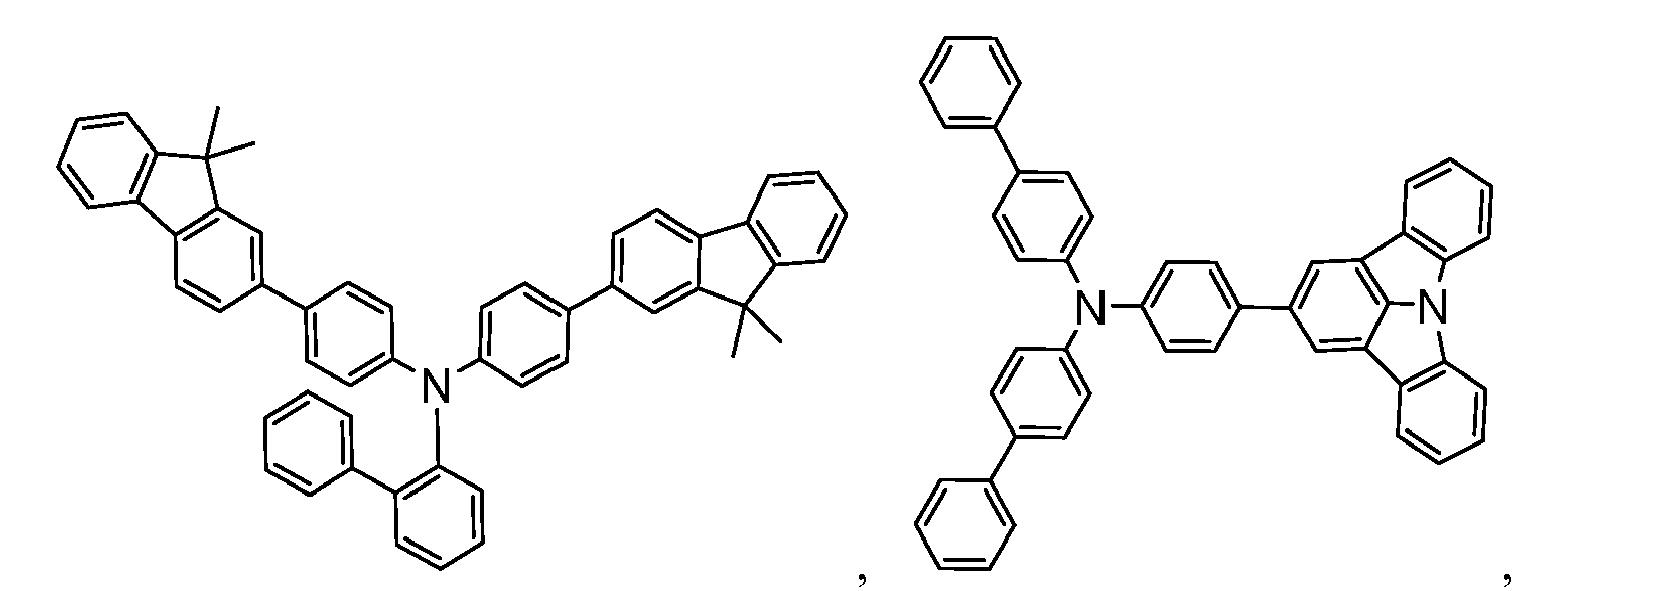 Figure imgb0862